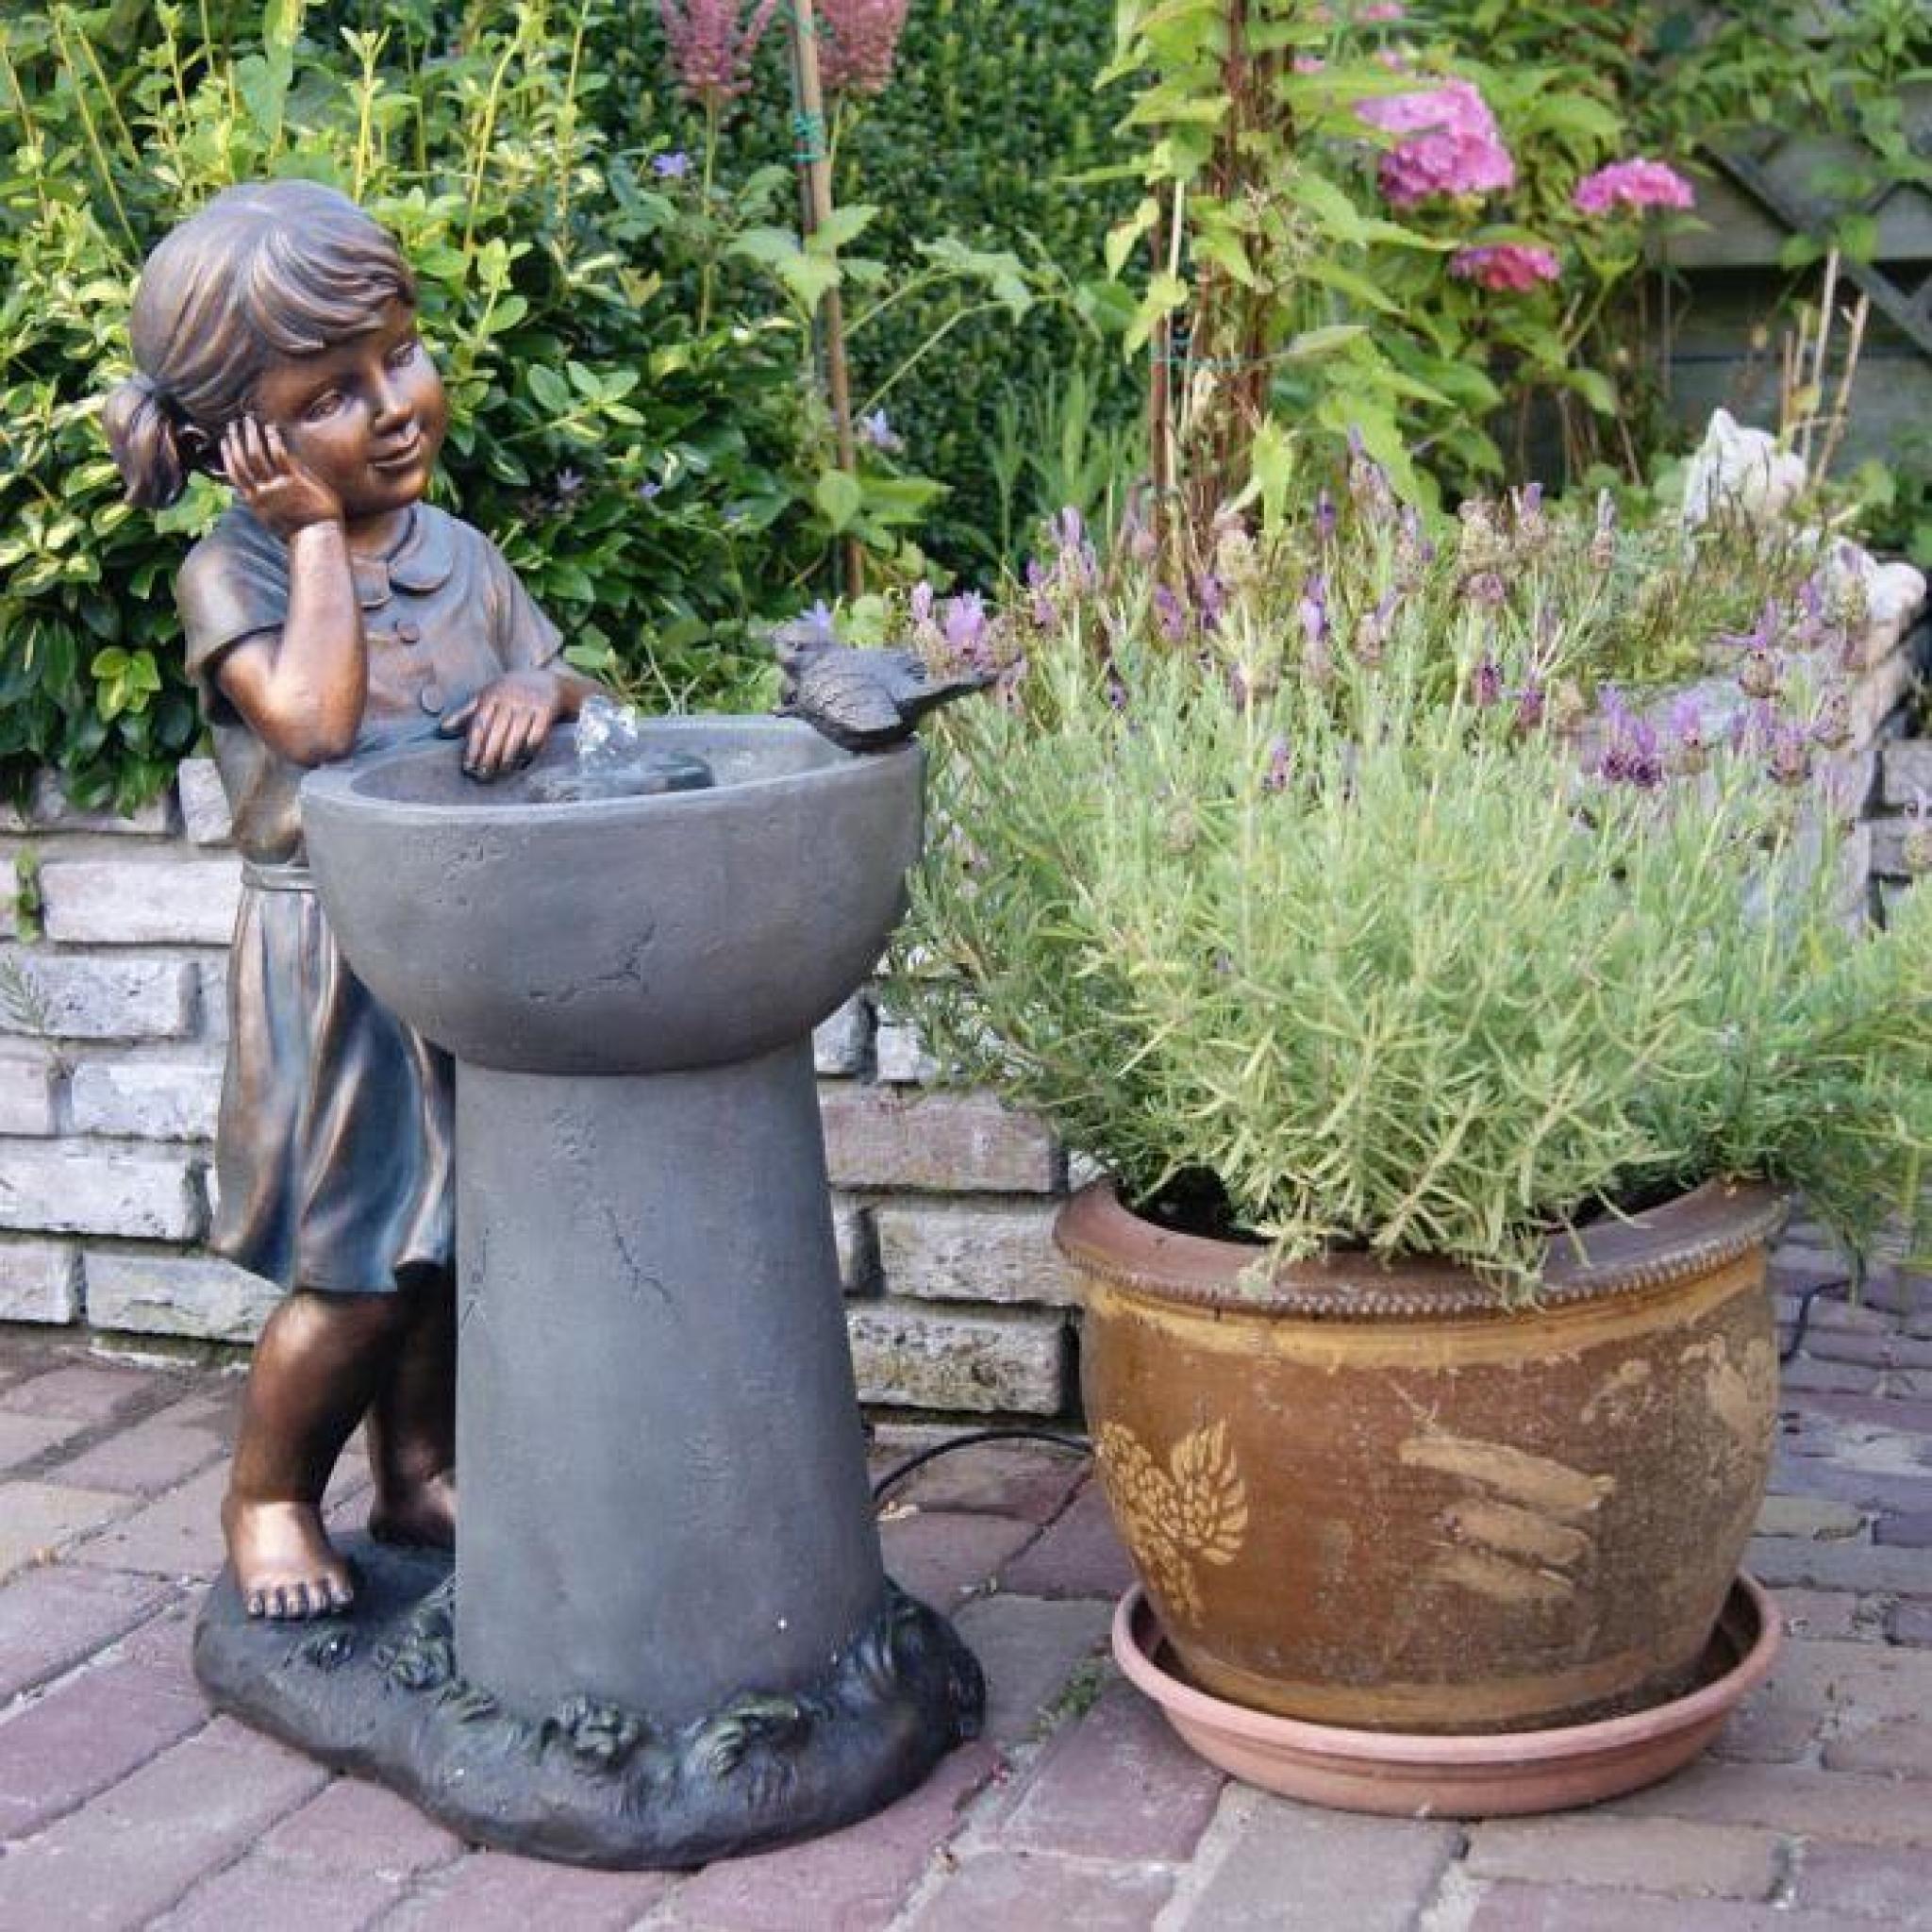 Fontaine De Jardin Petite Fille Avec Pompe Detroit- encequiconcerne Petite Fontaine De Jardin Pas Cher